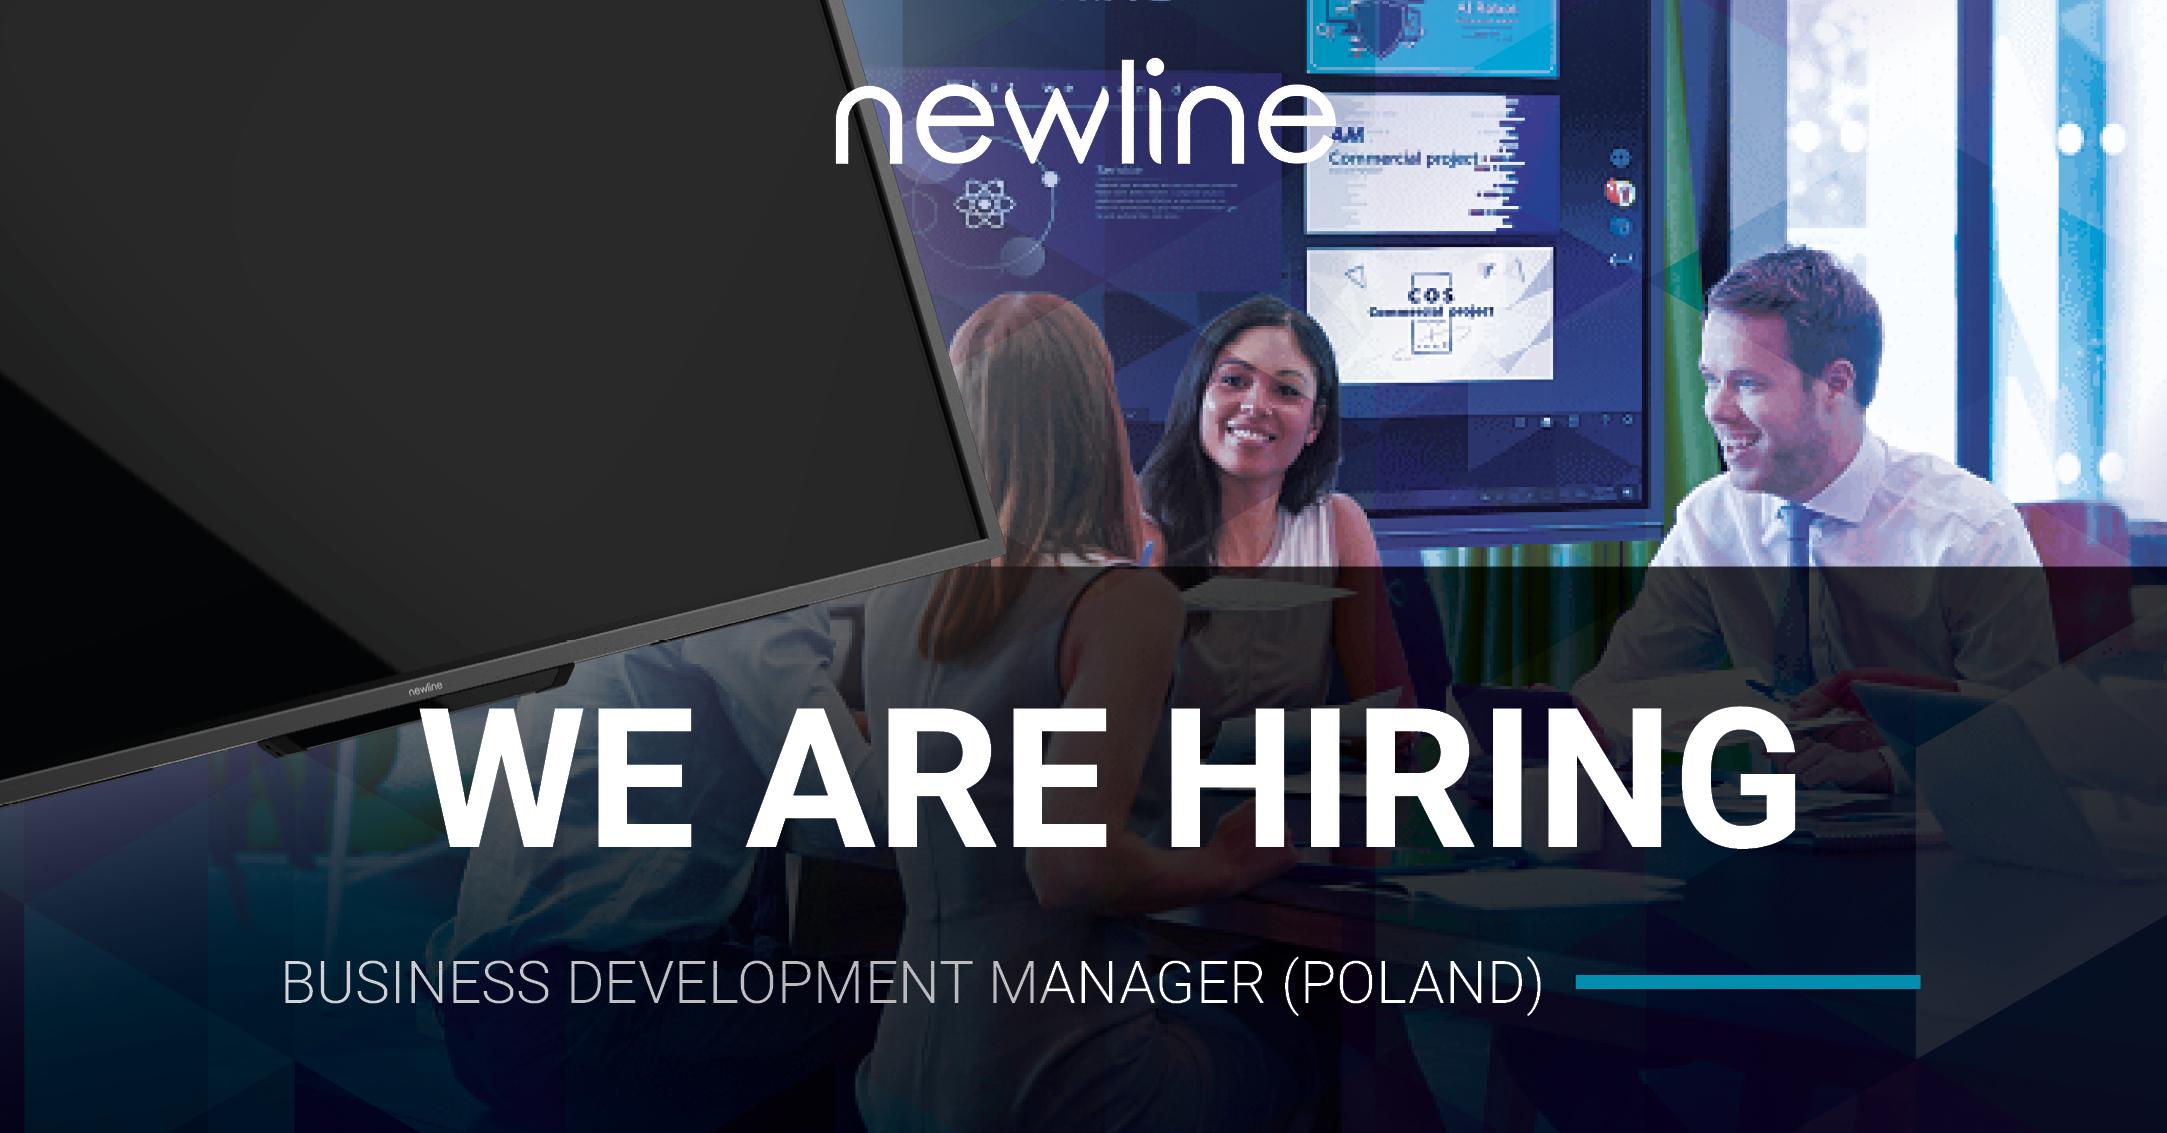 Newline is Hiring! Business Development Manager (Poland)